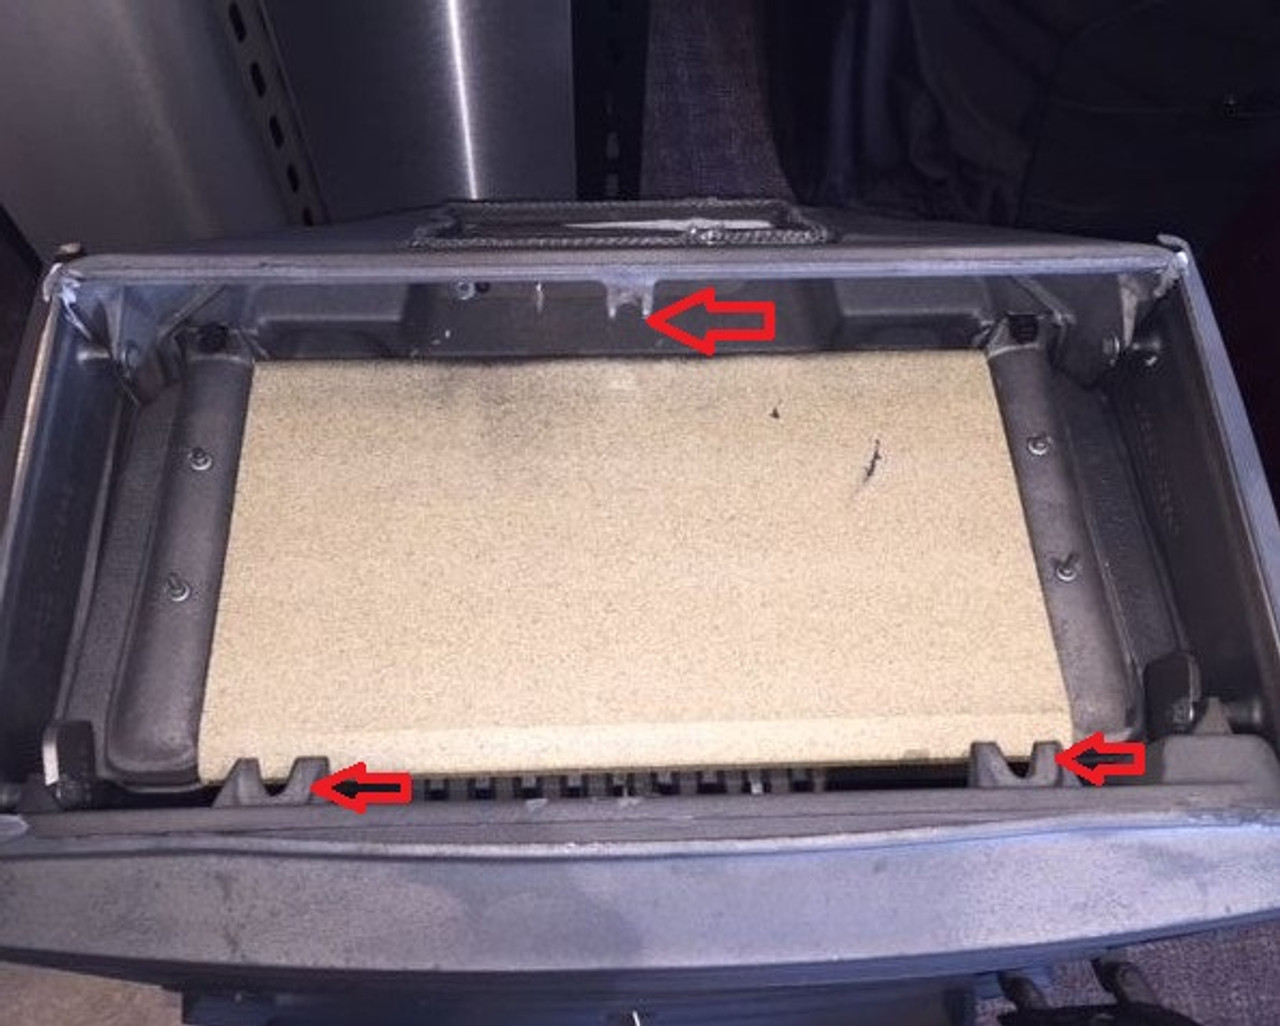 Jotul F500 Wood stove  220460 F500 Vermiculite Baffle